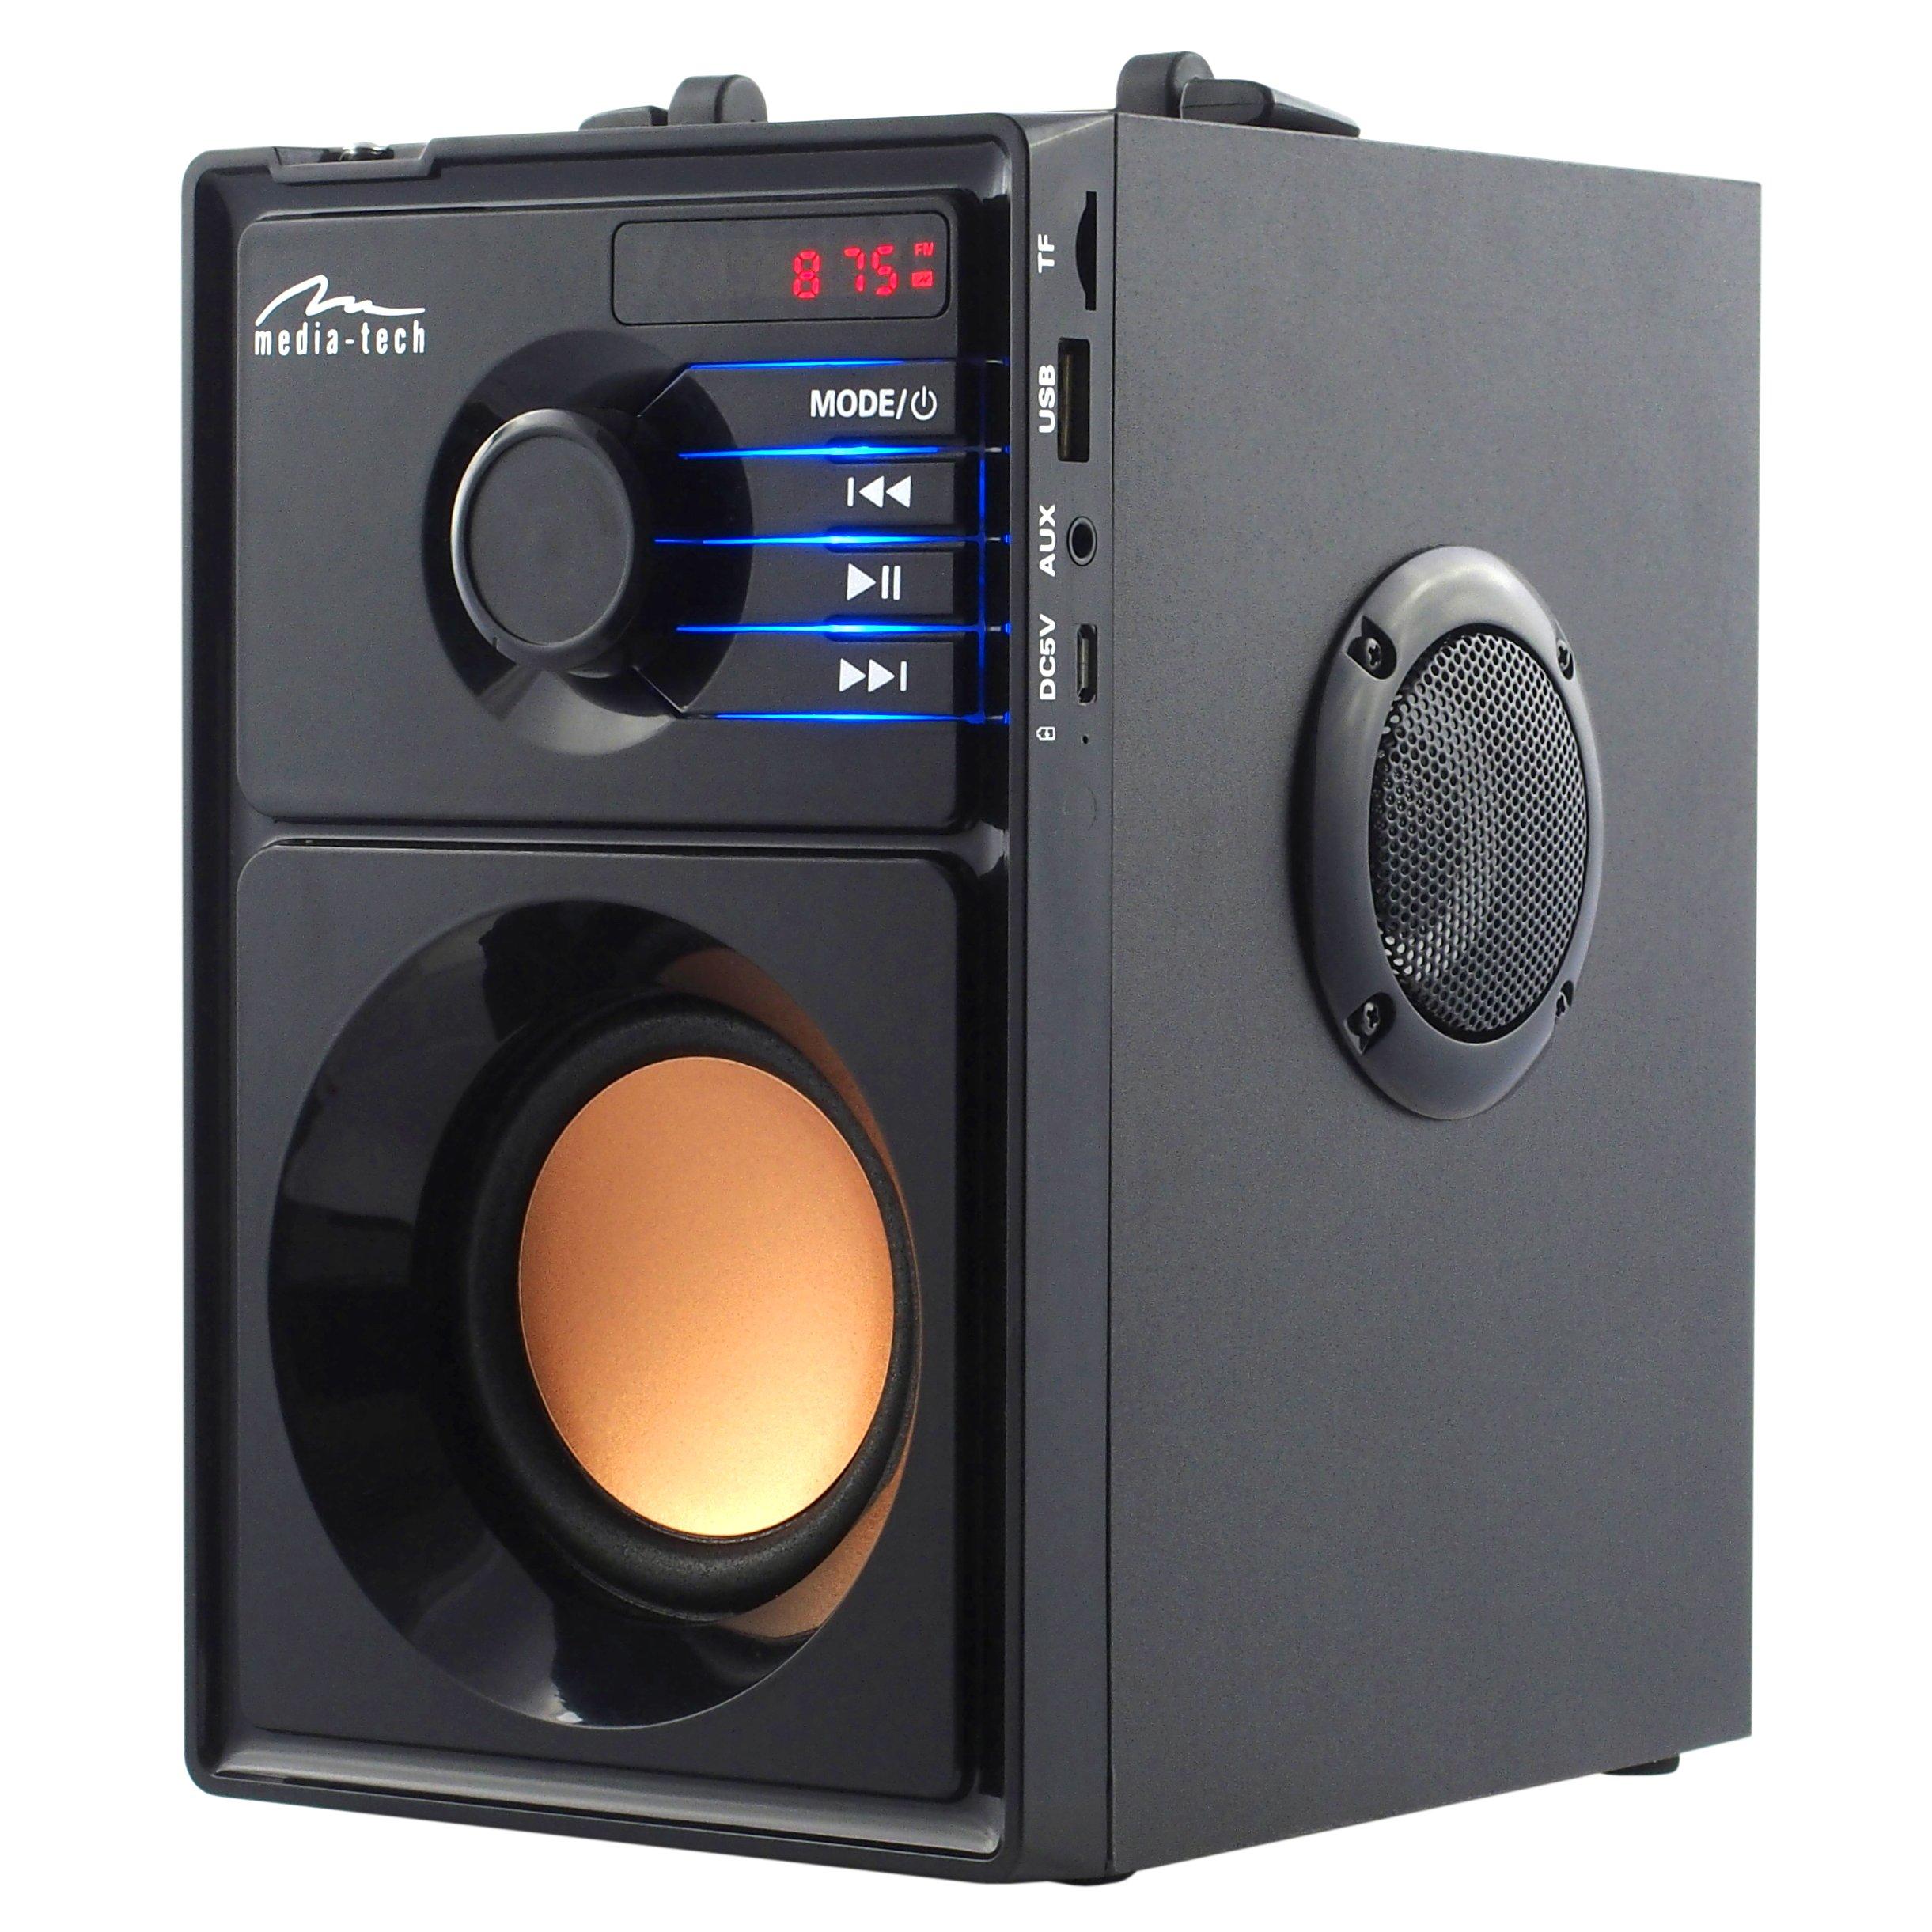 Item Bluetooth stereo speaker Media-Tech MT3145 15W MP3